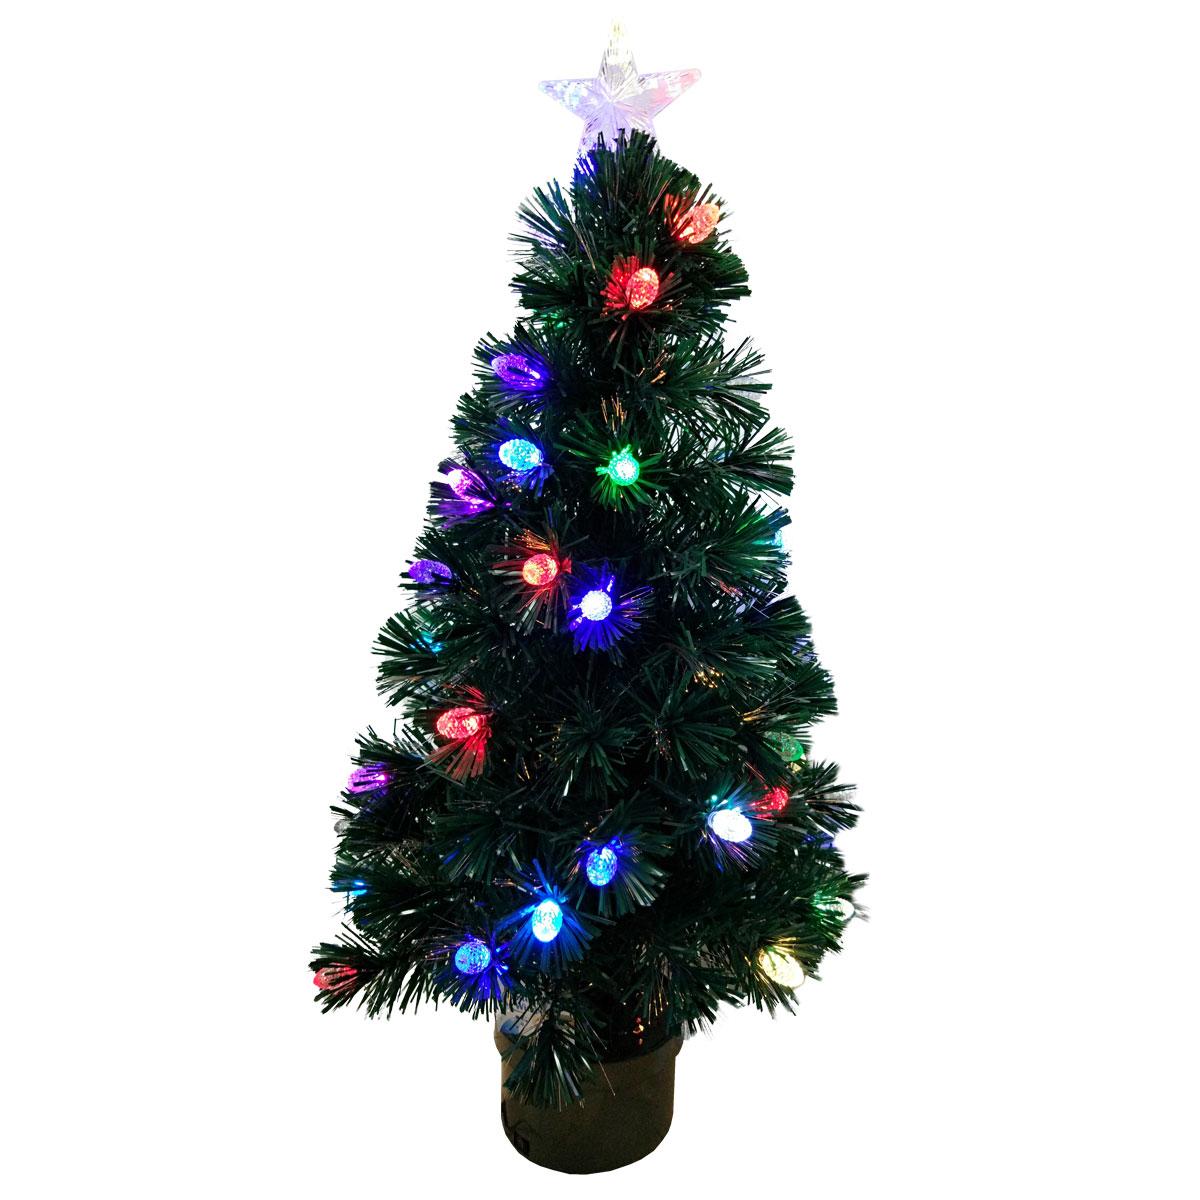 Елка световод Winter Wings 90 см 100 веток с разноцветными супер-яркими шишками 42 LED шишки<br>